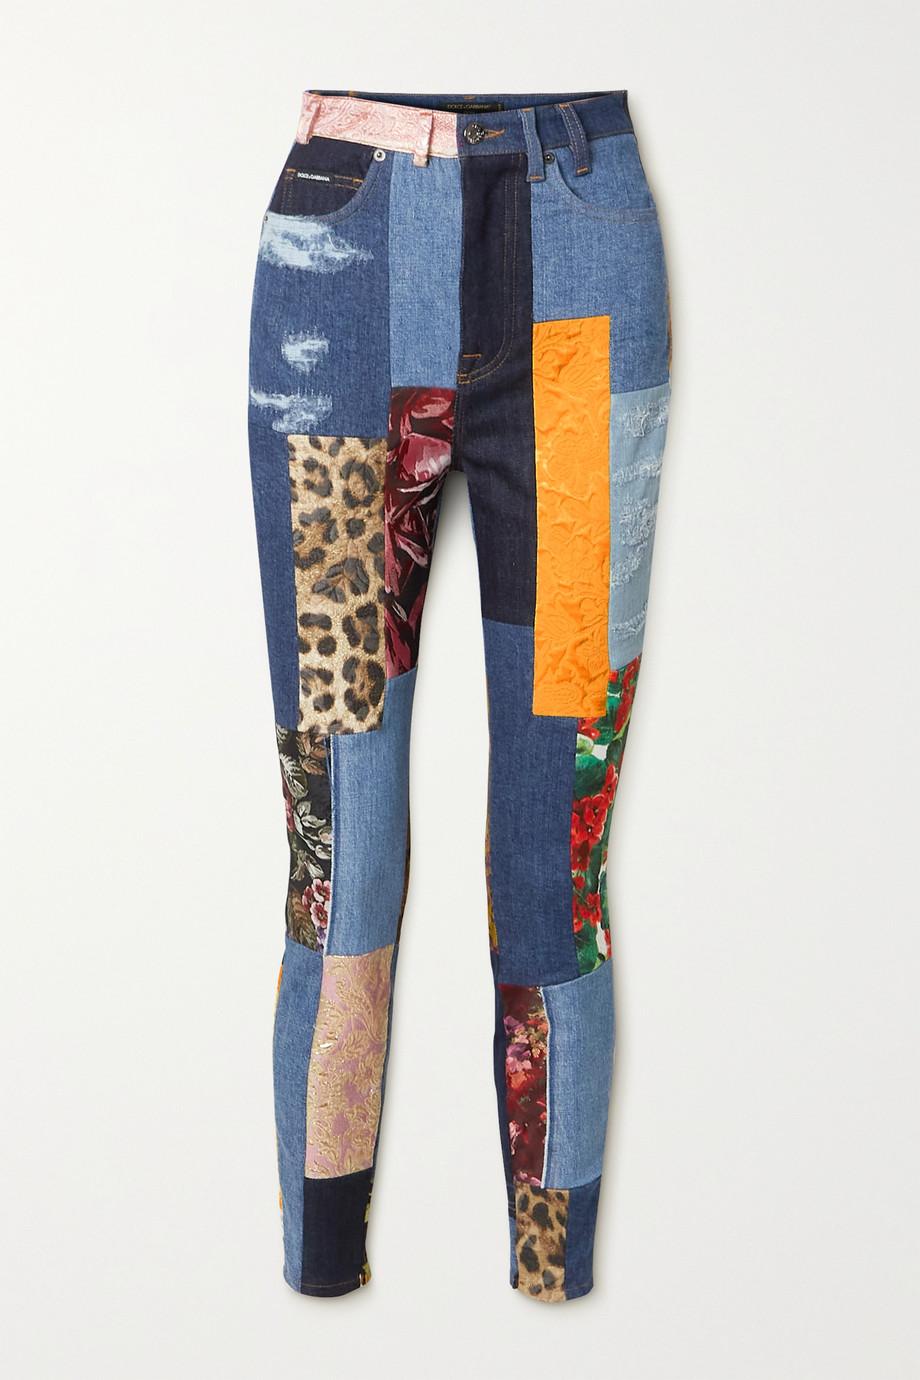 Dolce & Gabbana Patchwork printed cotton-blend skinny jeans